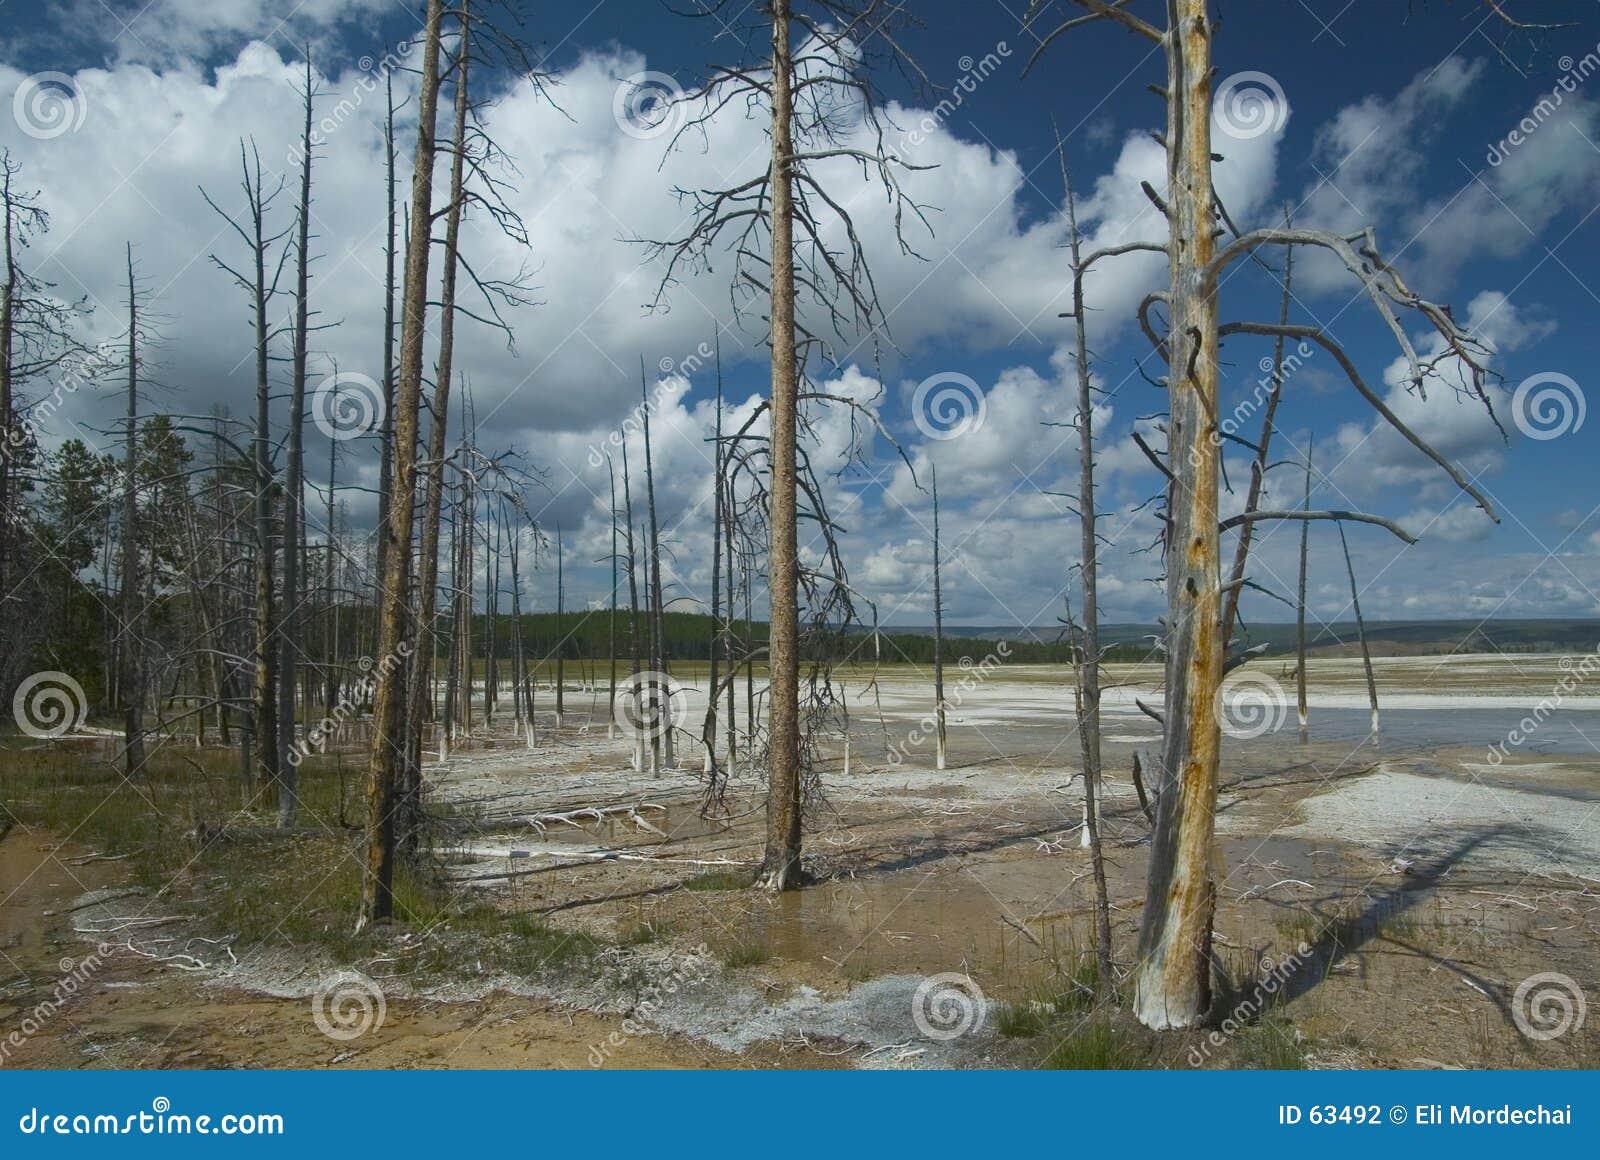 Download νεκρά δέντρα στοκ εικόνες. εικόνα από εθνικός, πάρκο, γραφικός - 63492